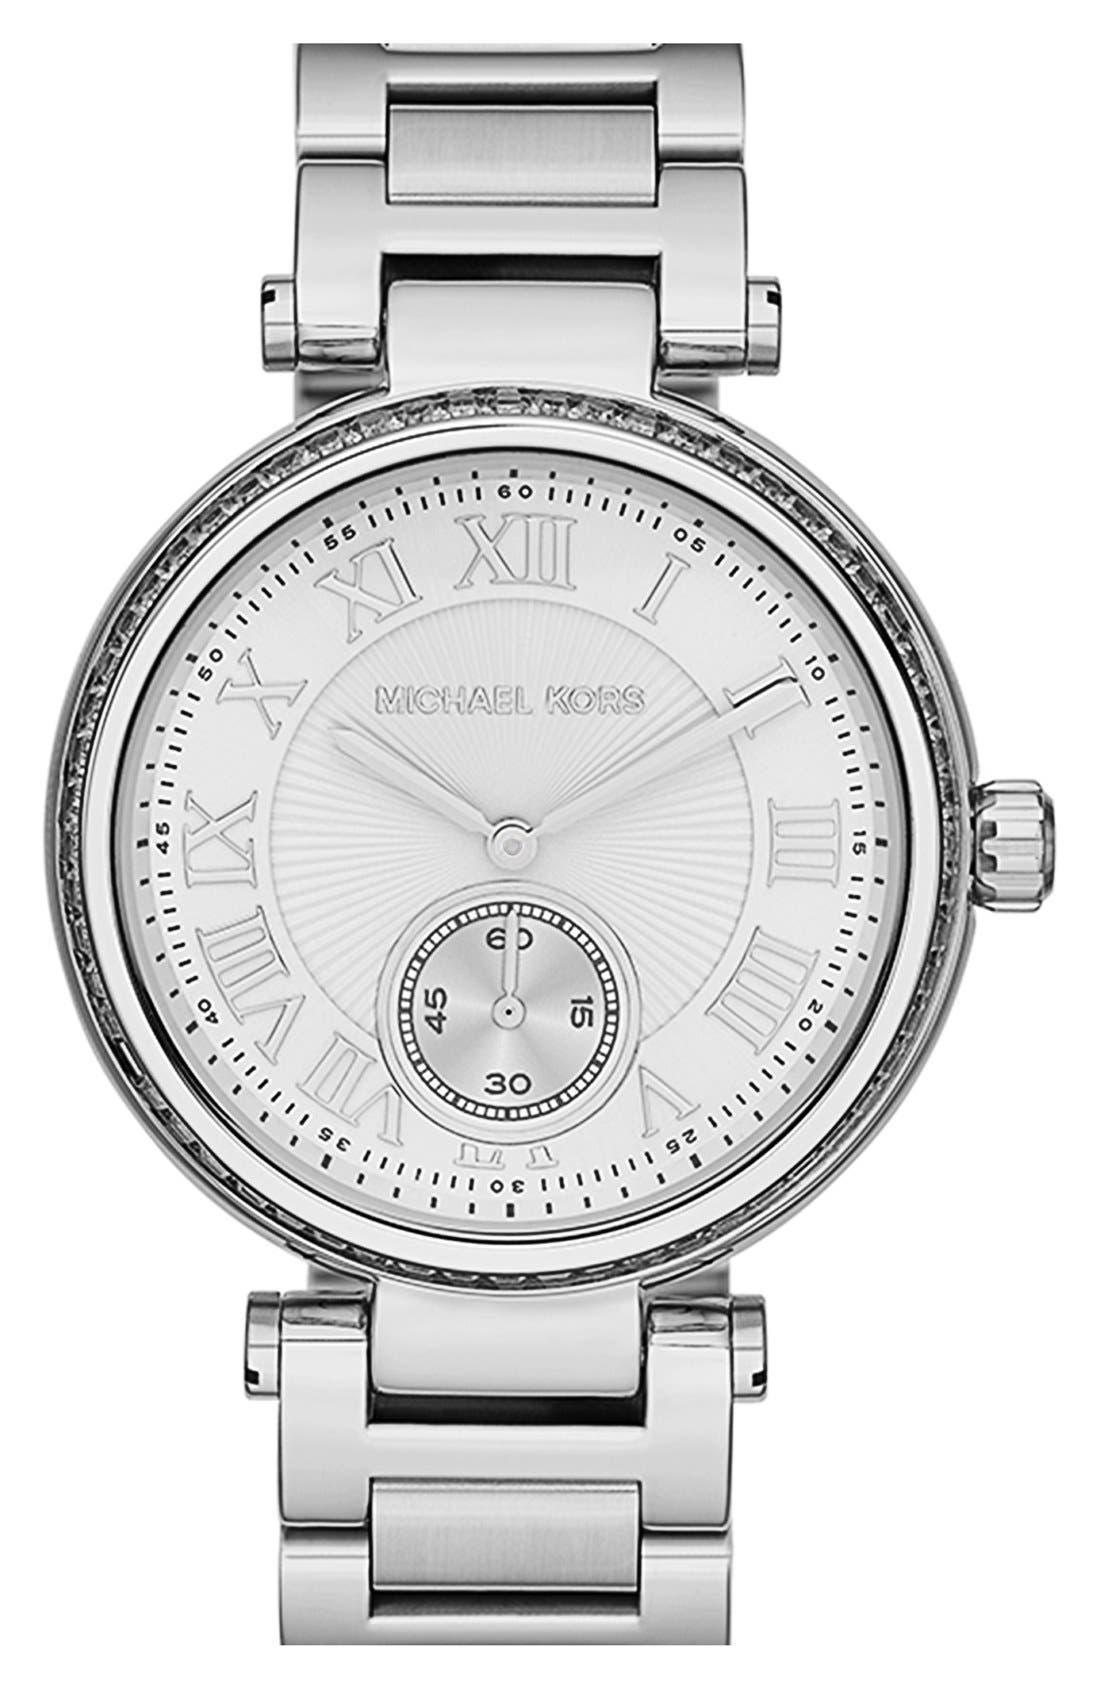 Main Image - Michael Kors 'Skylar' Crystal Bezel Bracelet Watch, 42mm